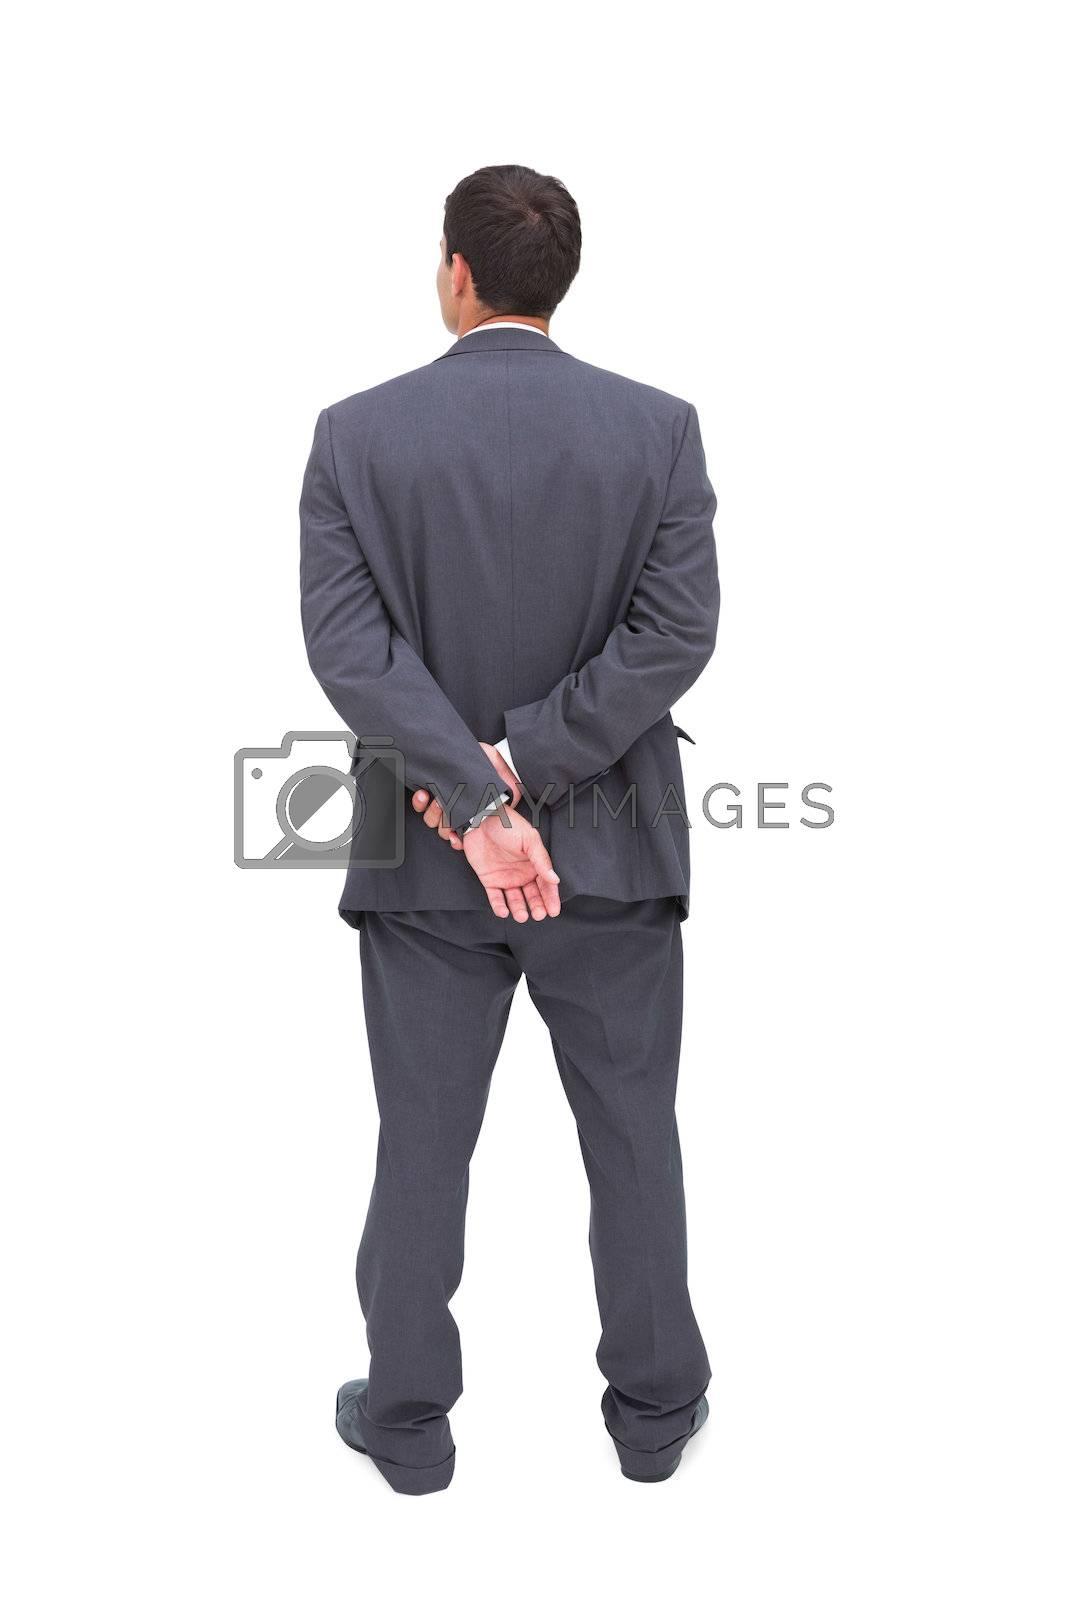 Rear view of classy businessman posing by Wavebreakmedia